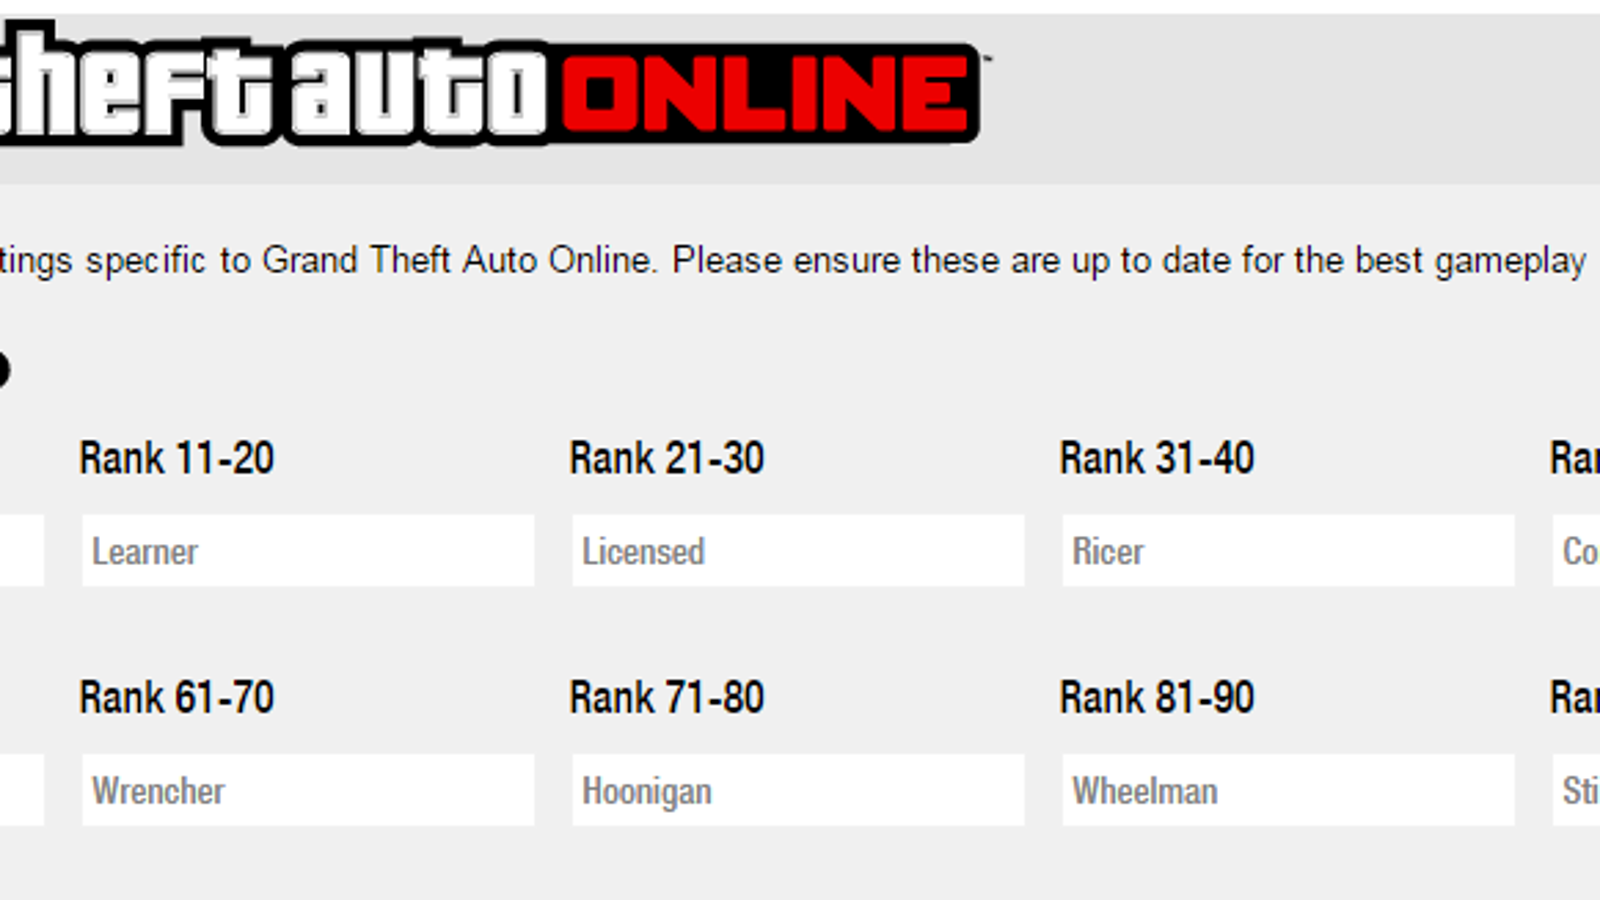 Updated my GTA V crew's rank titles